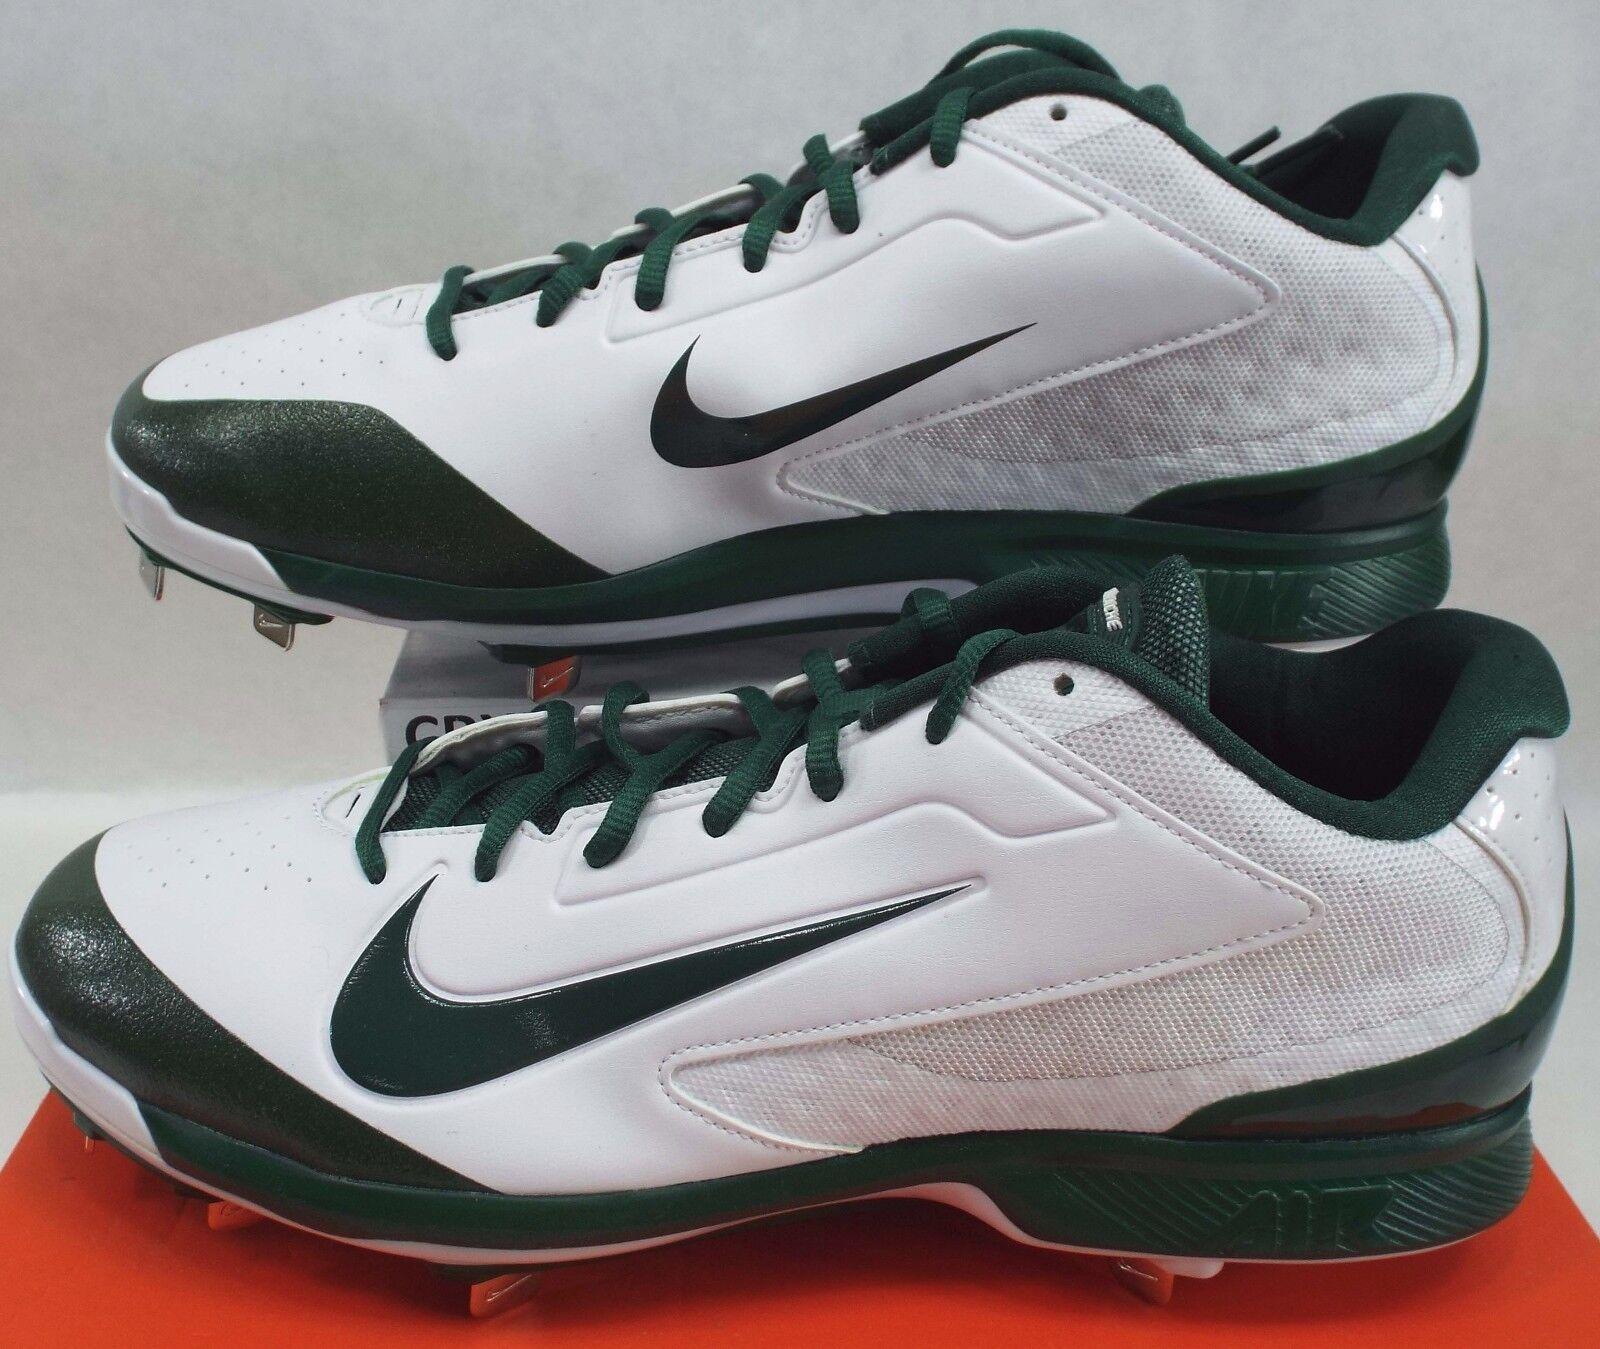 Nuevo Mens 13 Nike Air Huarache Pro Baja Botines De Metal blancoo verde 654854-130